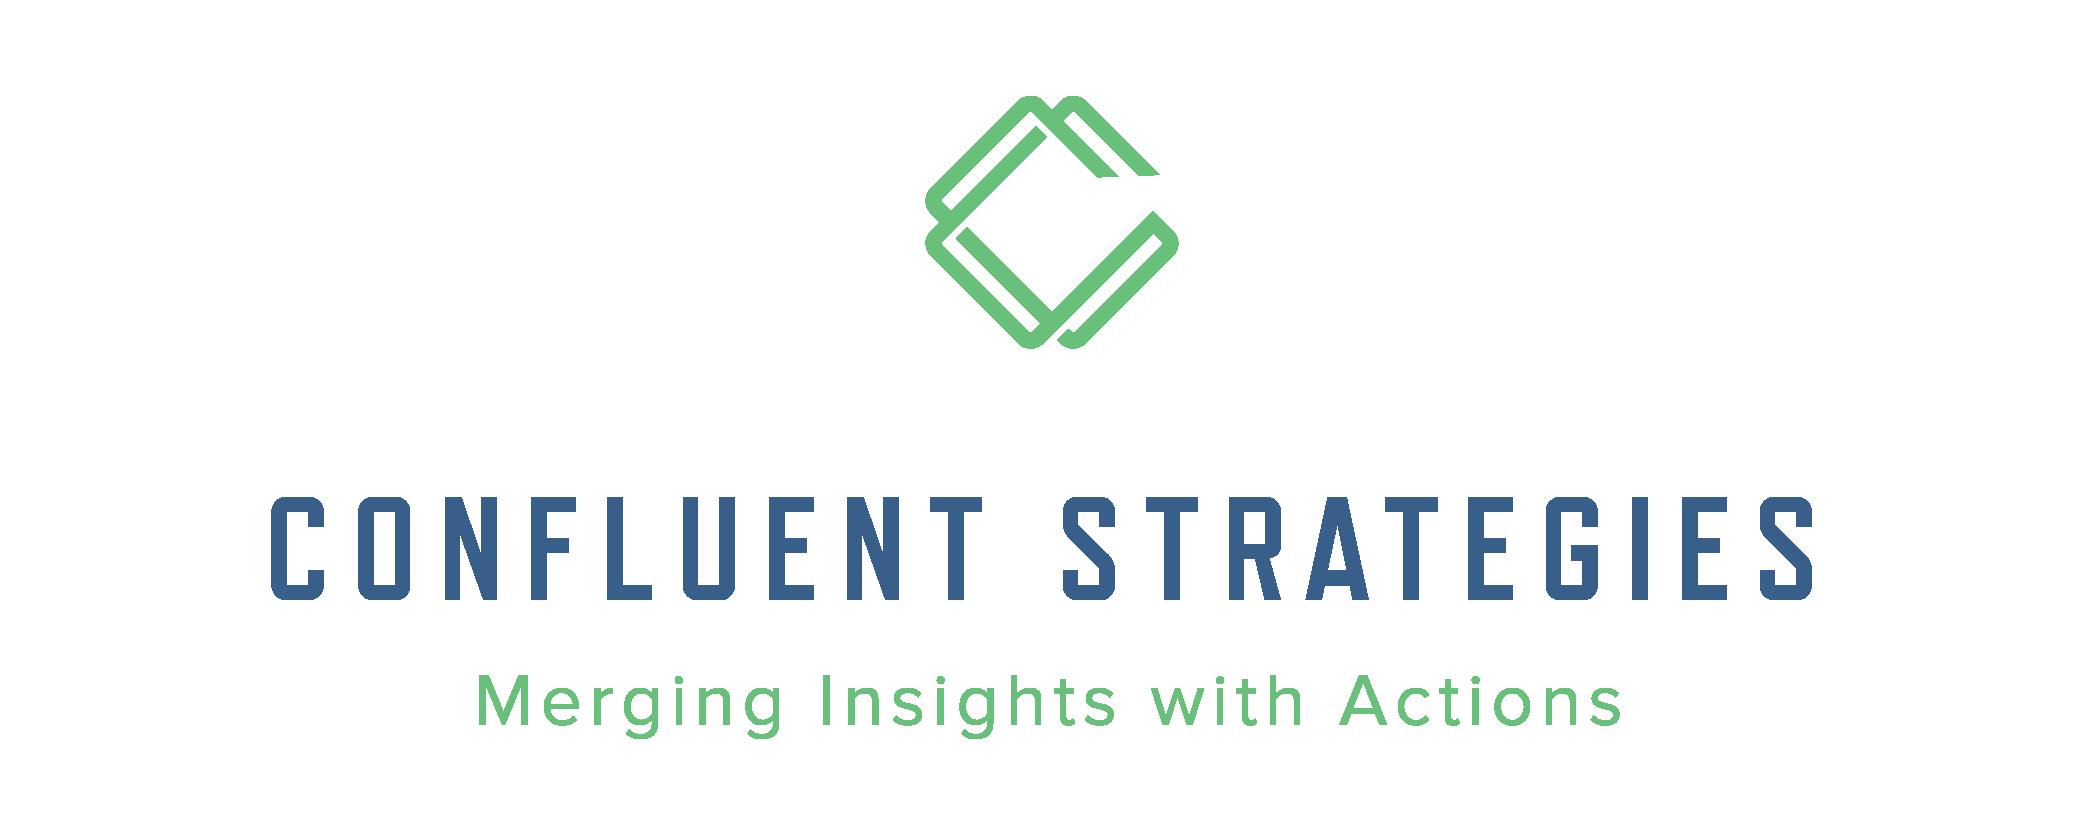 Confluent Strategies logo